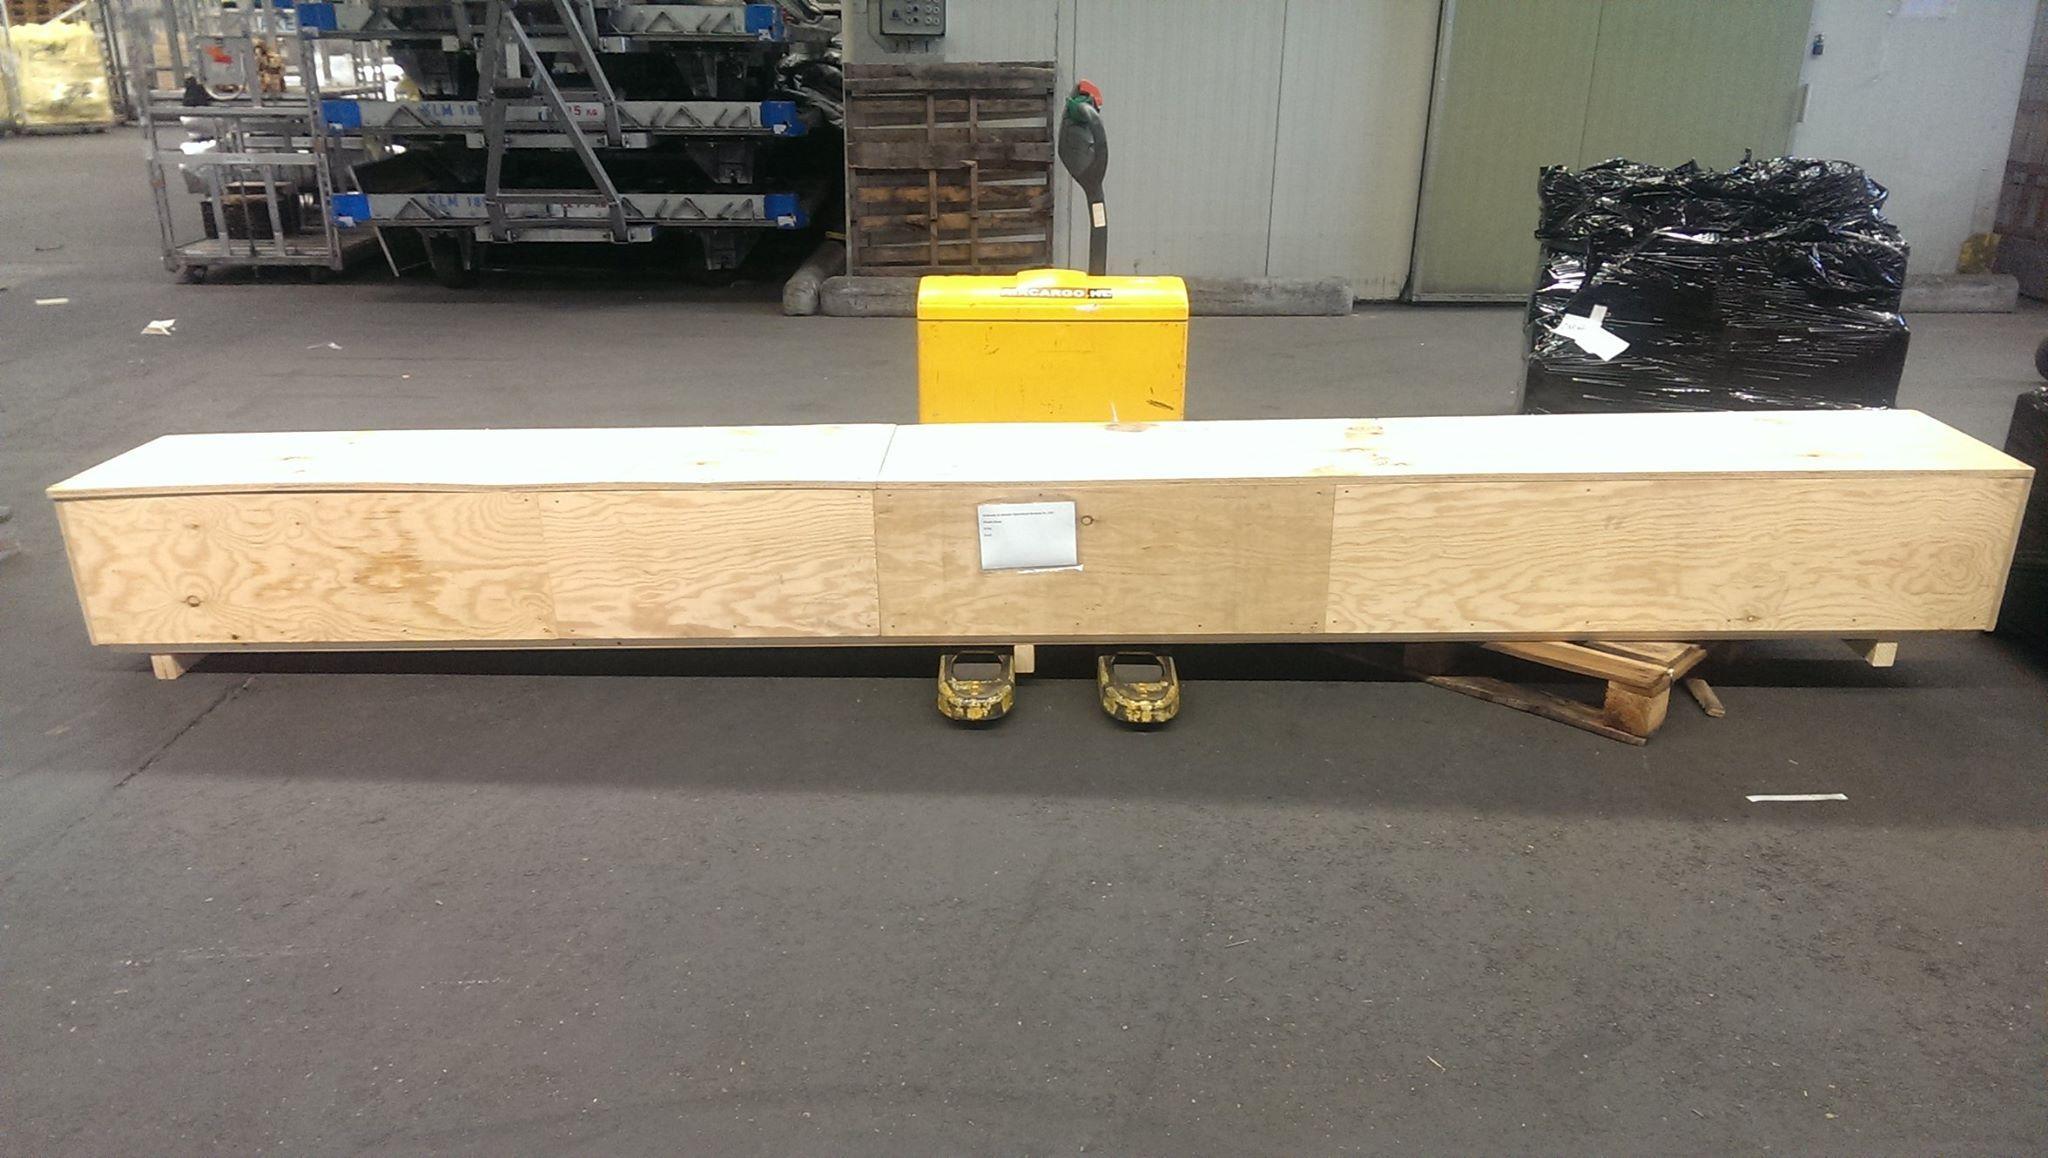 oversized cargo? no problem